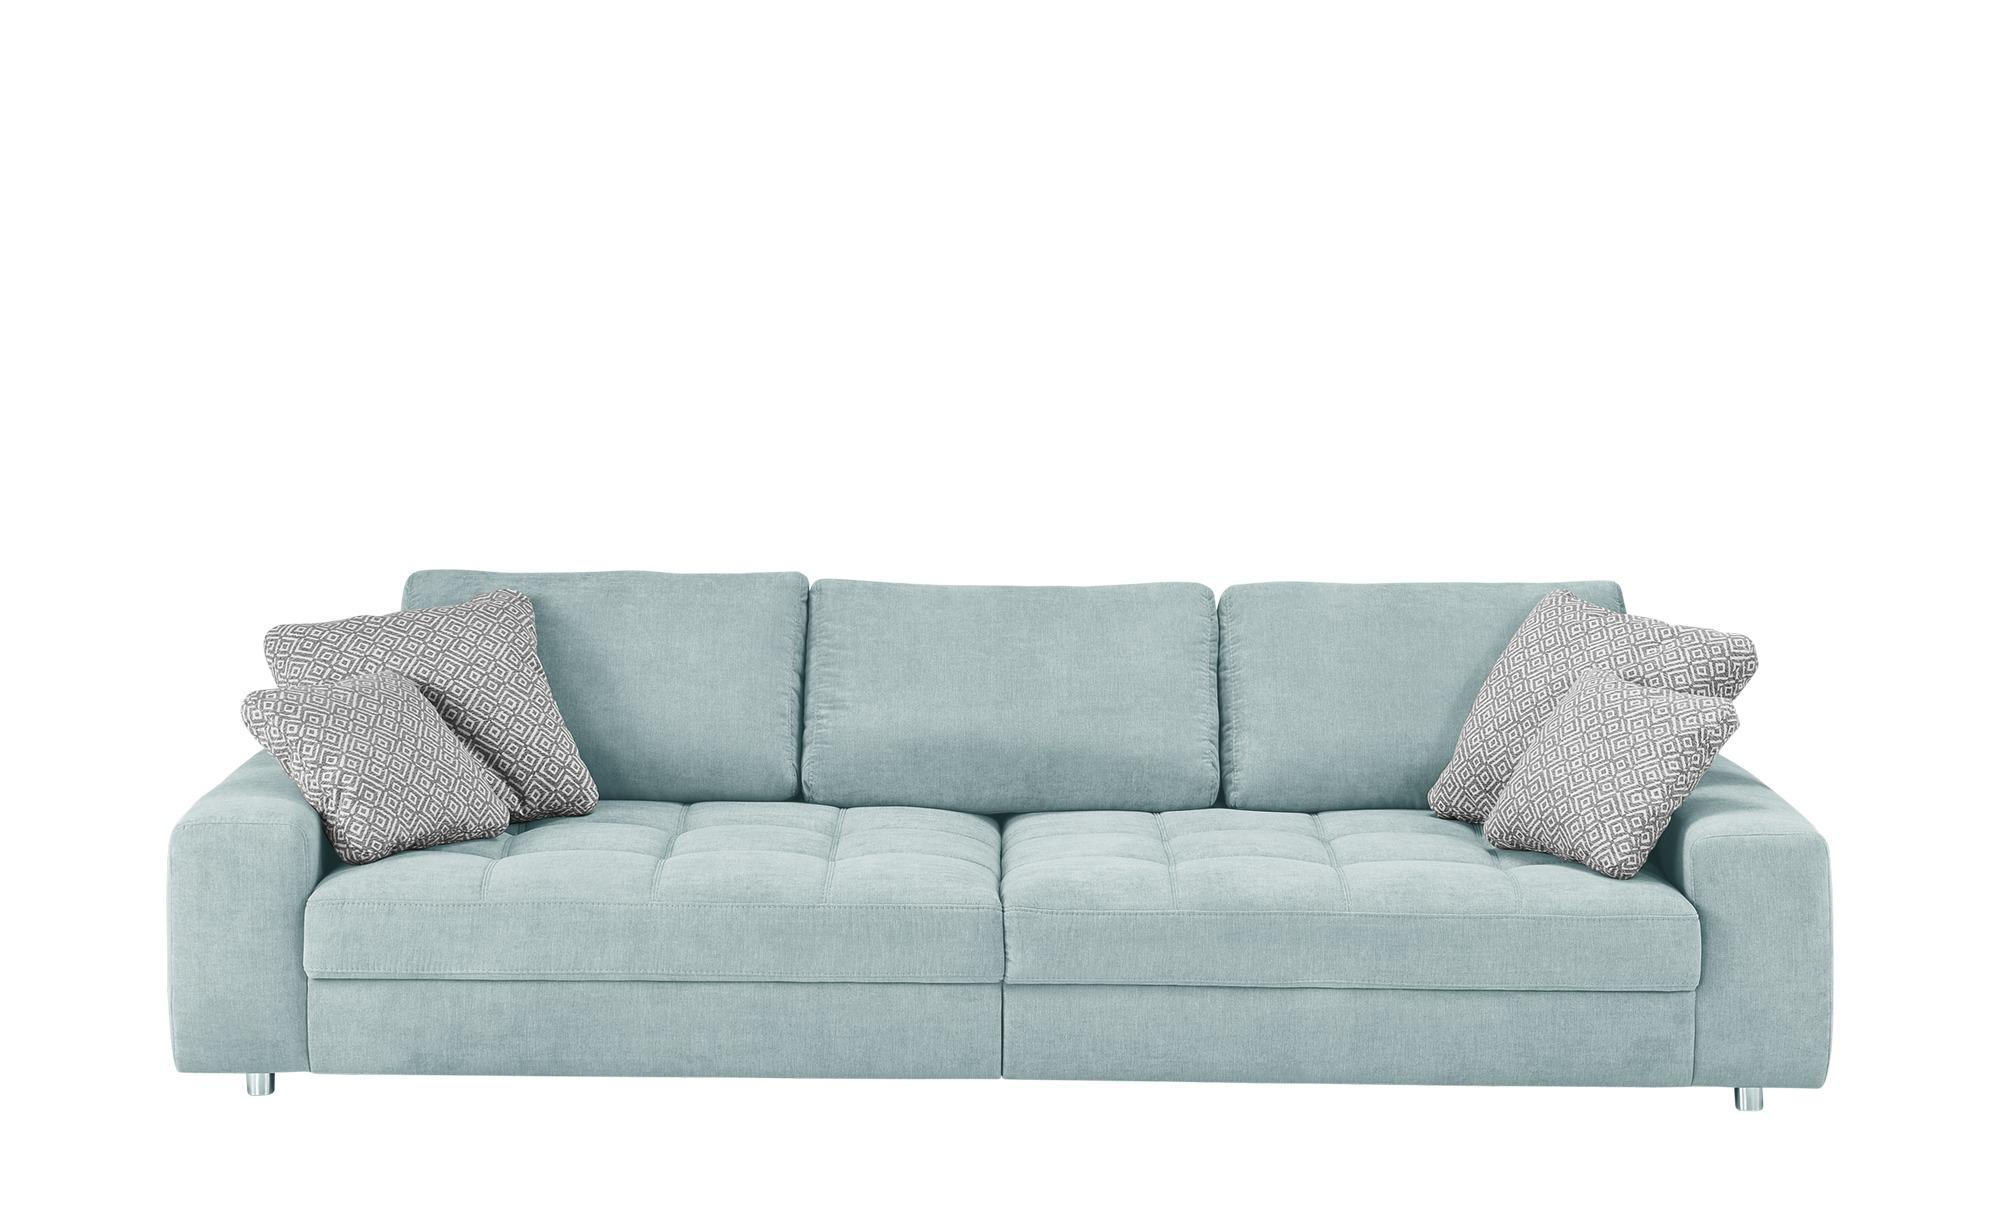 bobb Big Sofa  Arissa ¦ blau ¦ Maße (cm): B: 292 H: 84 T: 120 Polstermöbel > Sofas > Big-Sofas - Höffner